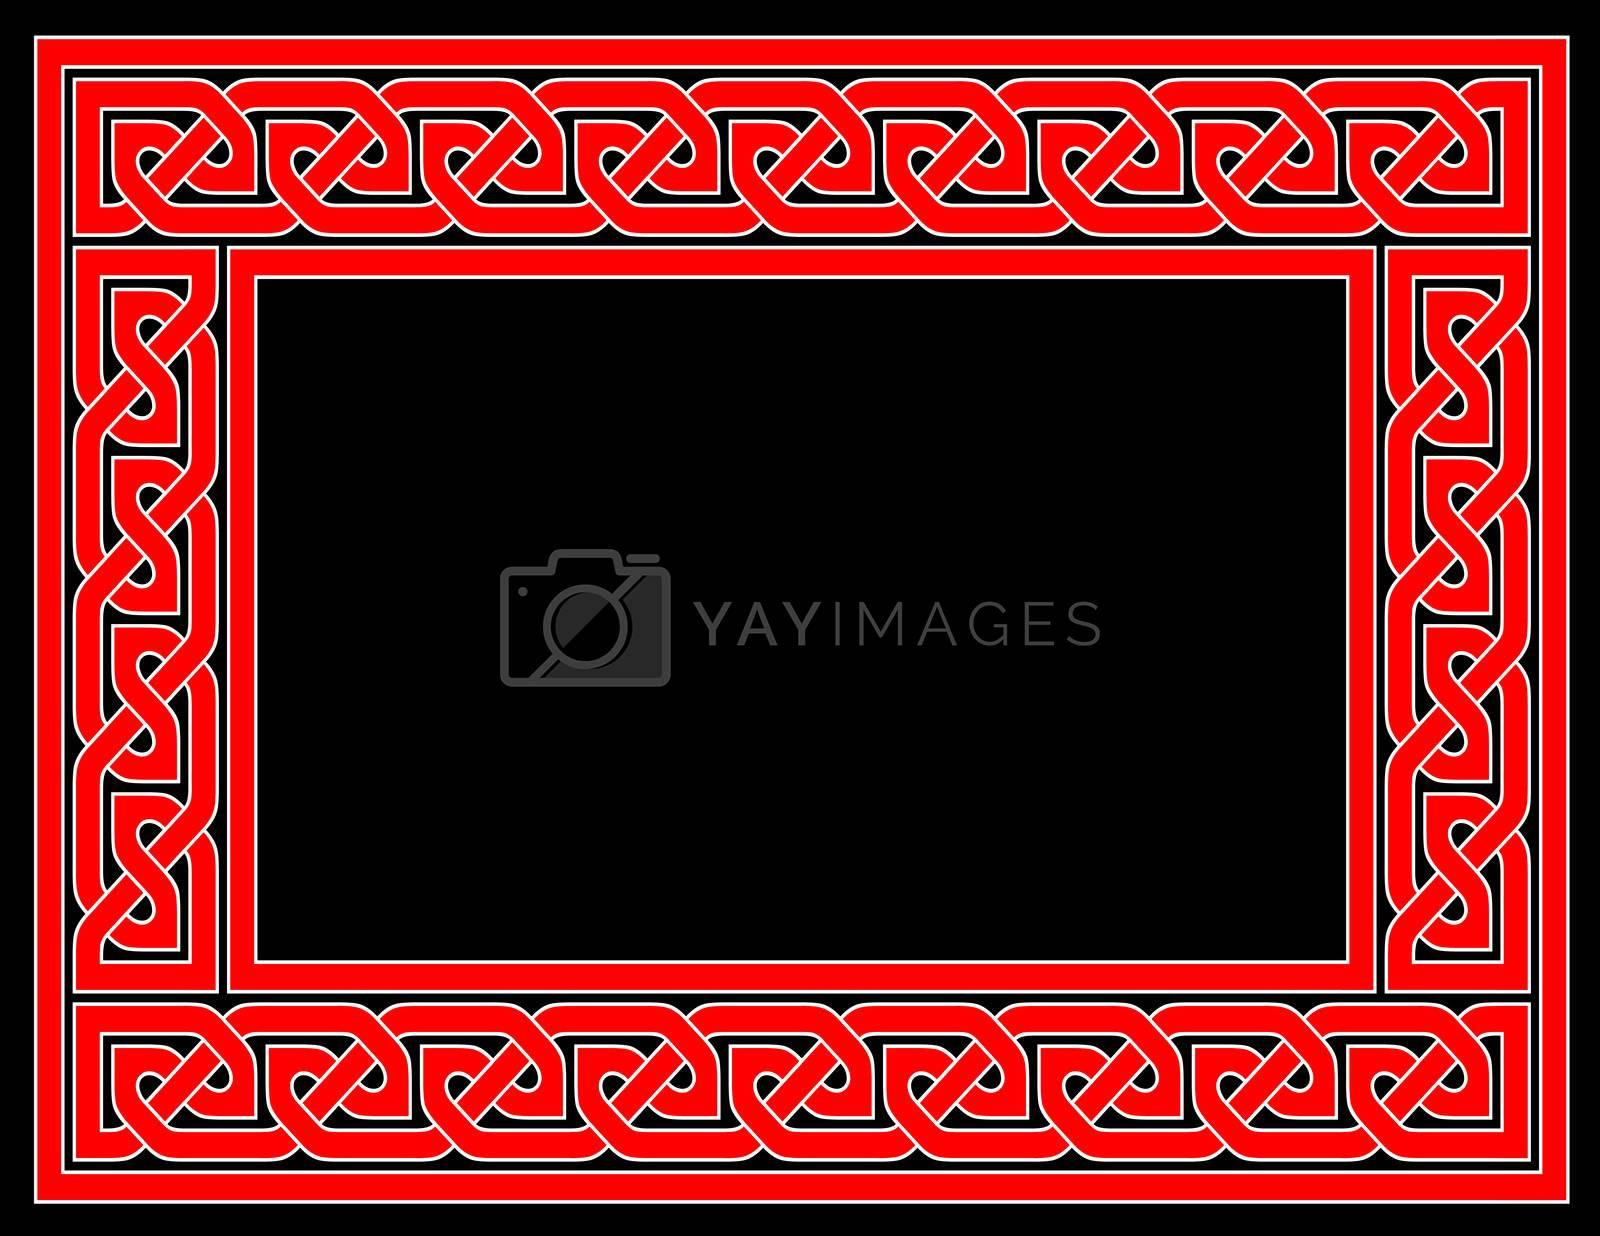 A red Celtic knot frame with black background, JPG version.